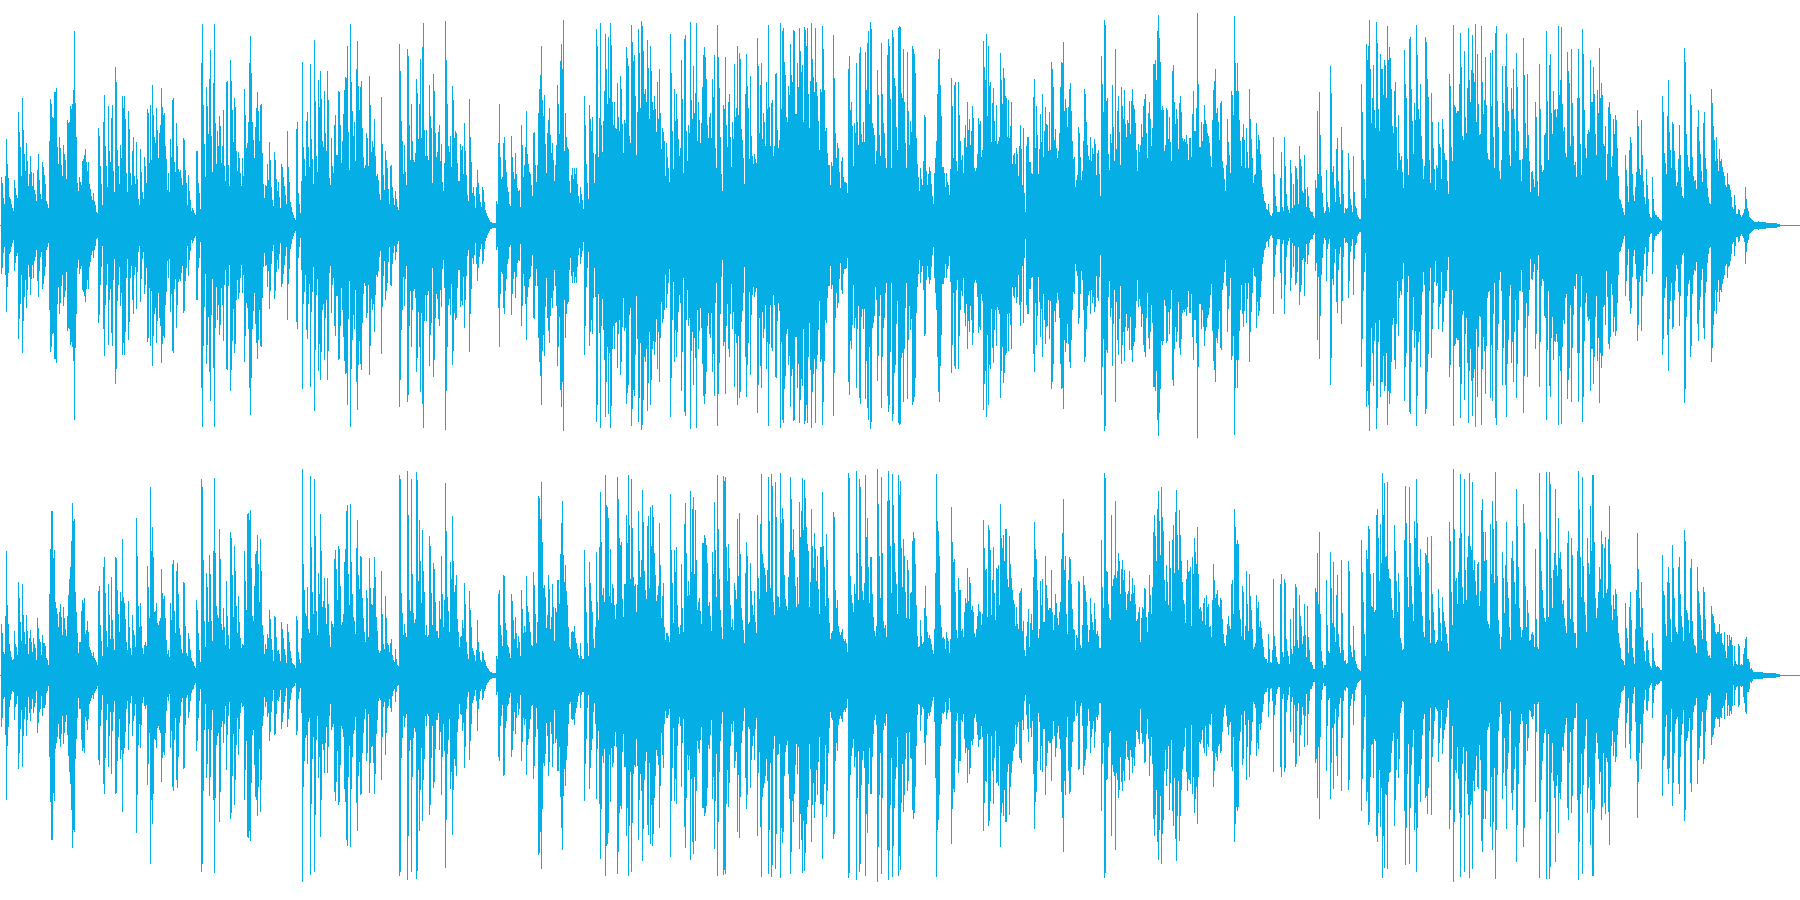 Greensleeves (piano)の再生済みの波形